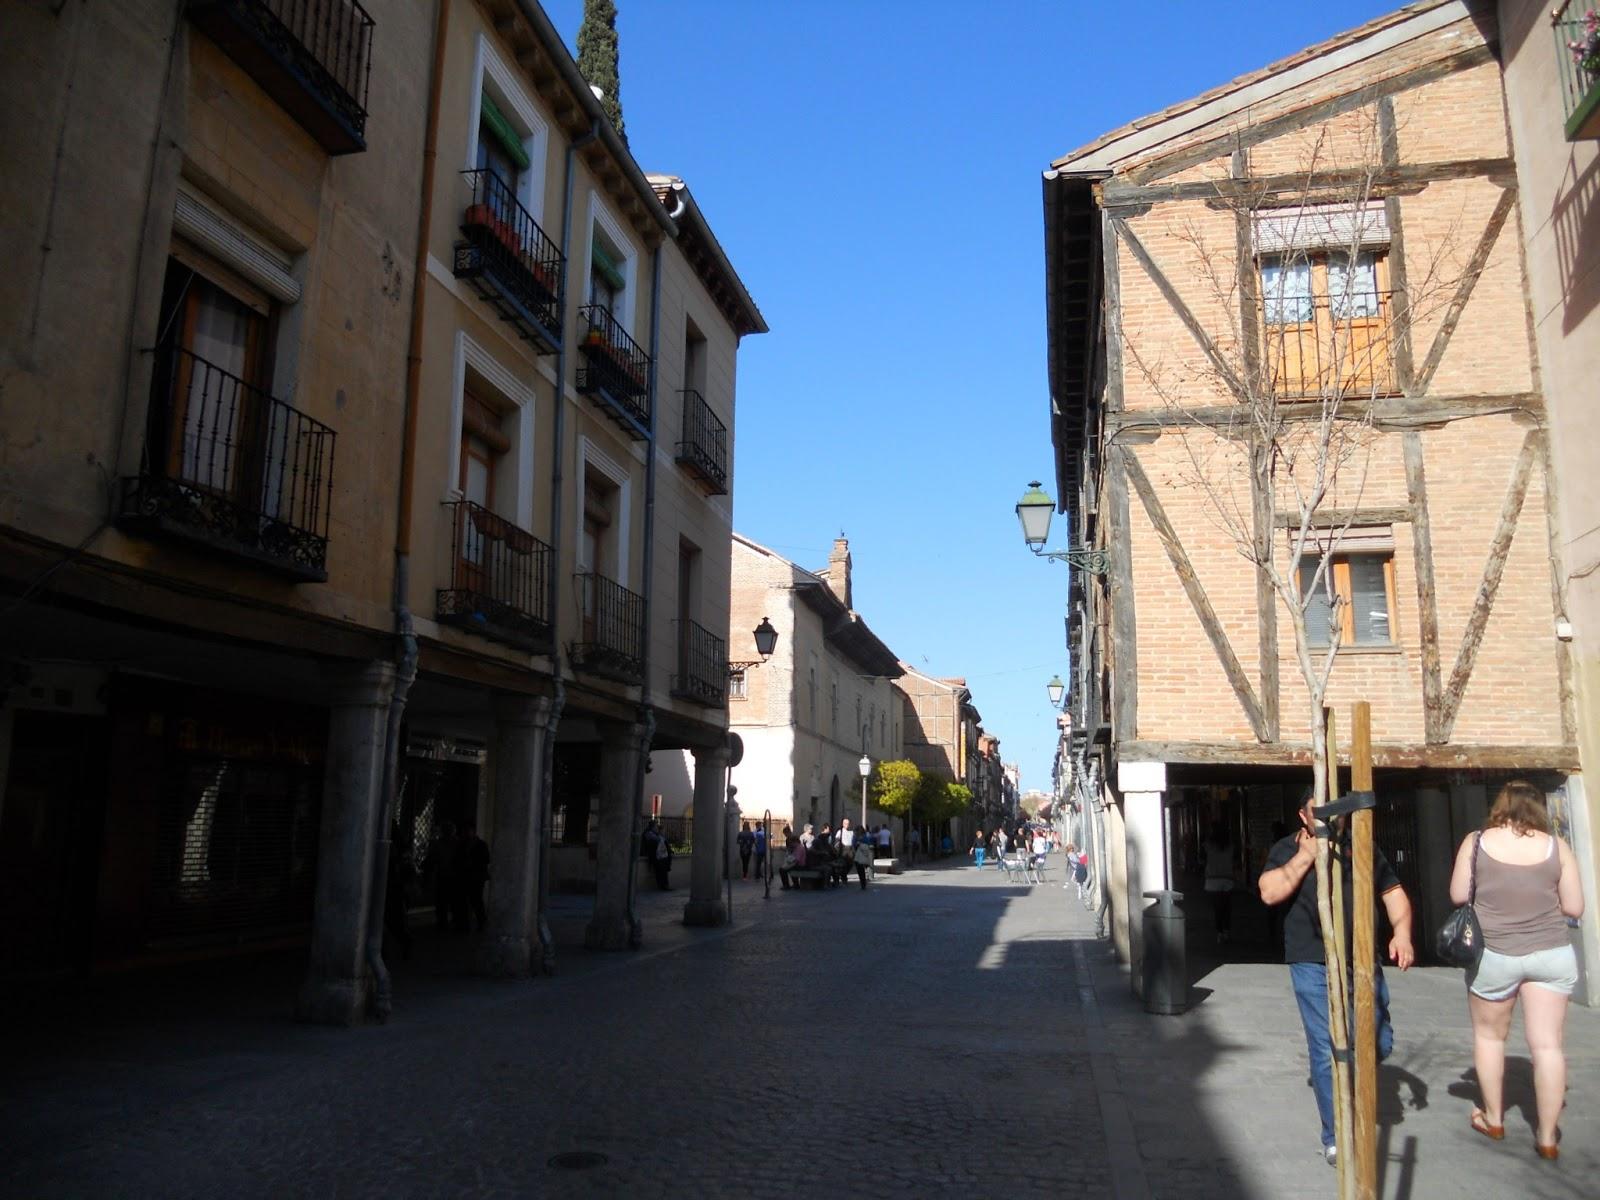 Calle camino de santiago alcala de henares